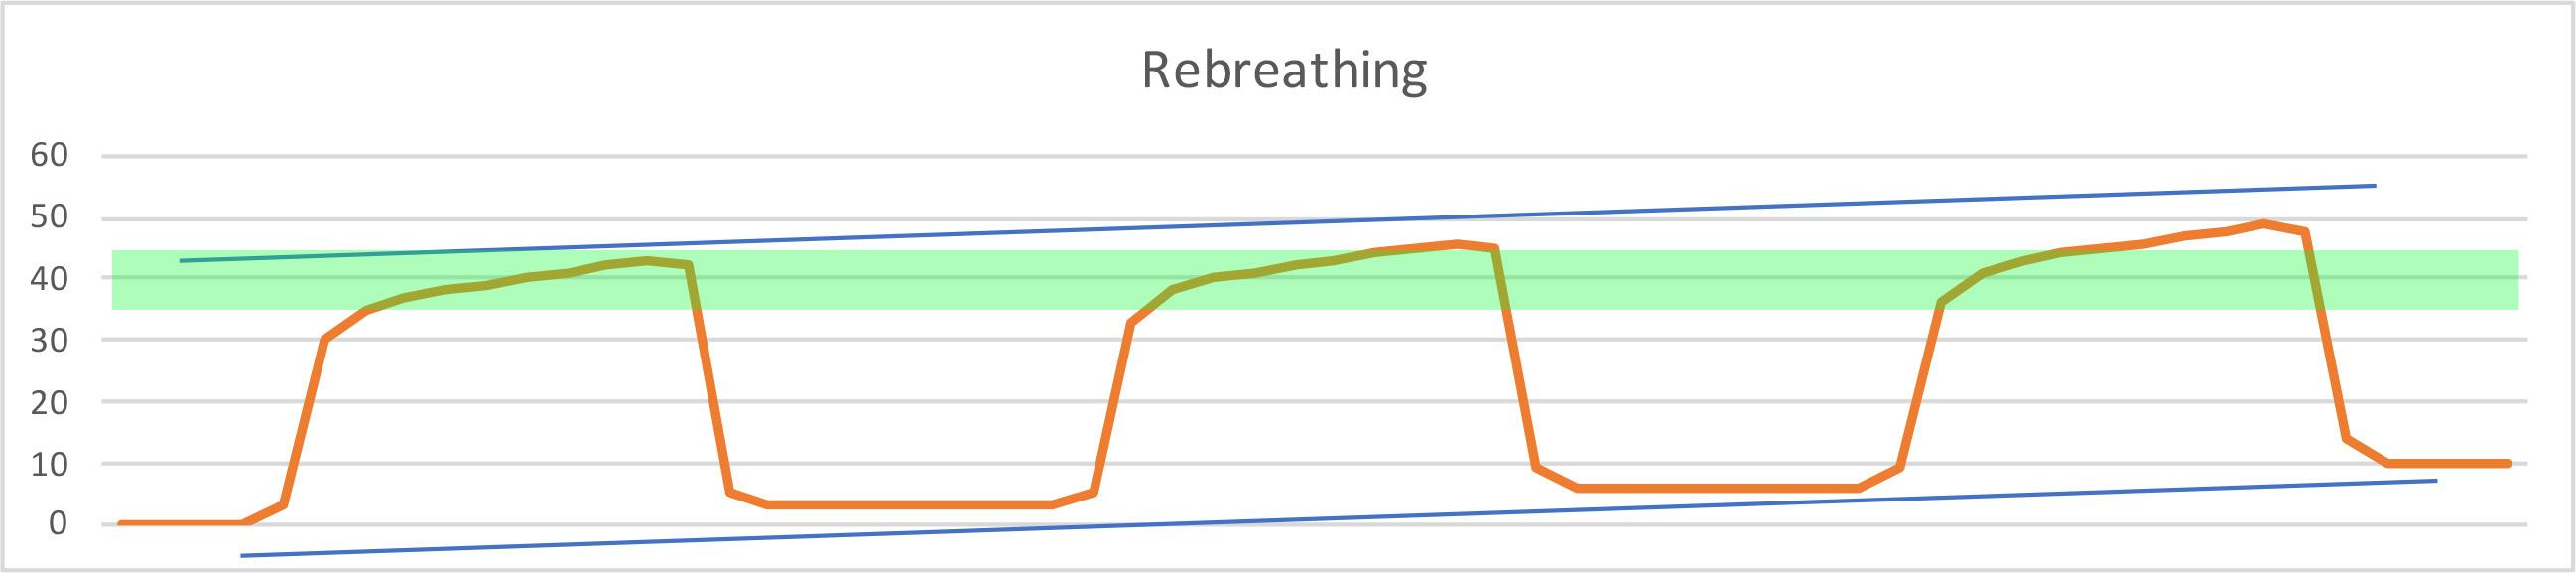 rebreathing.jpg#asset:3122